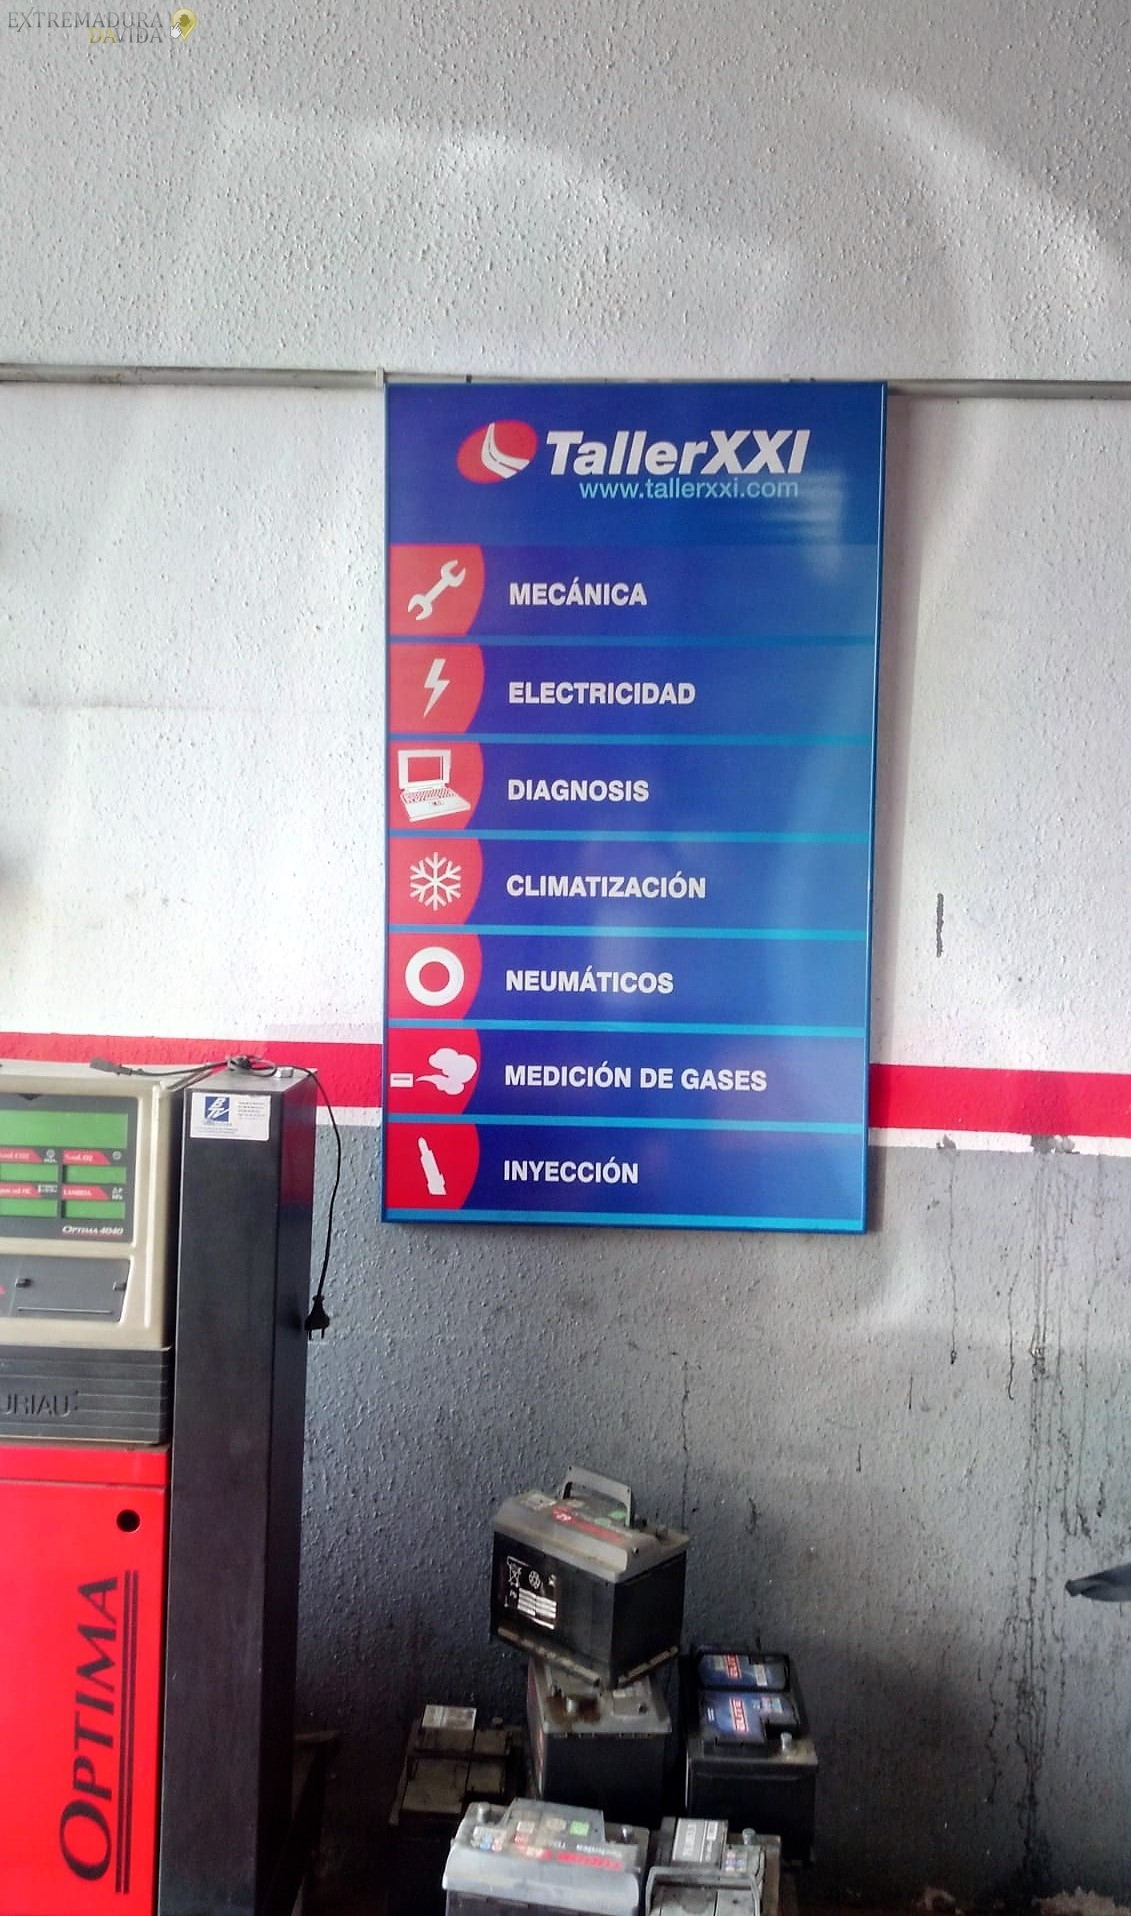 Taller en Almendralejo Mecánica y Electromecánica Common Rail